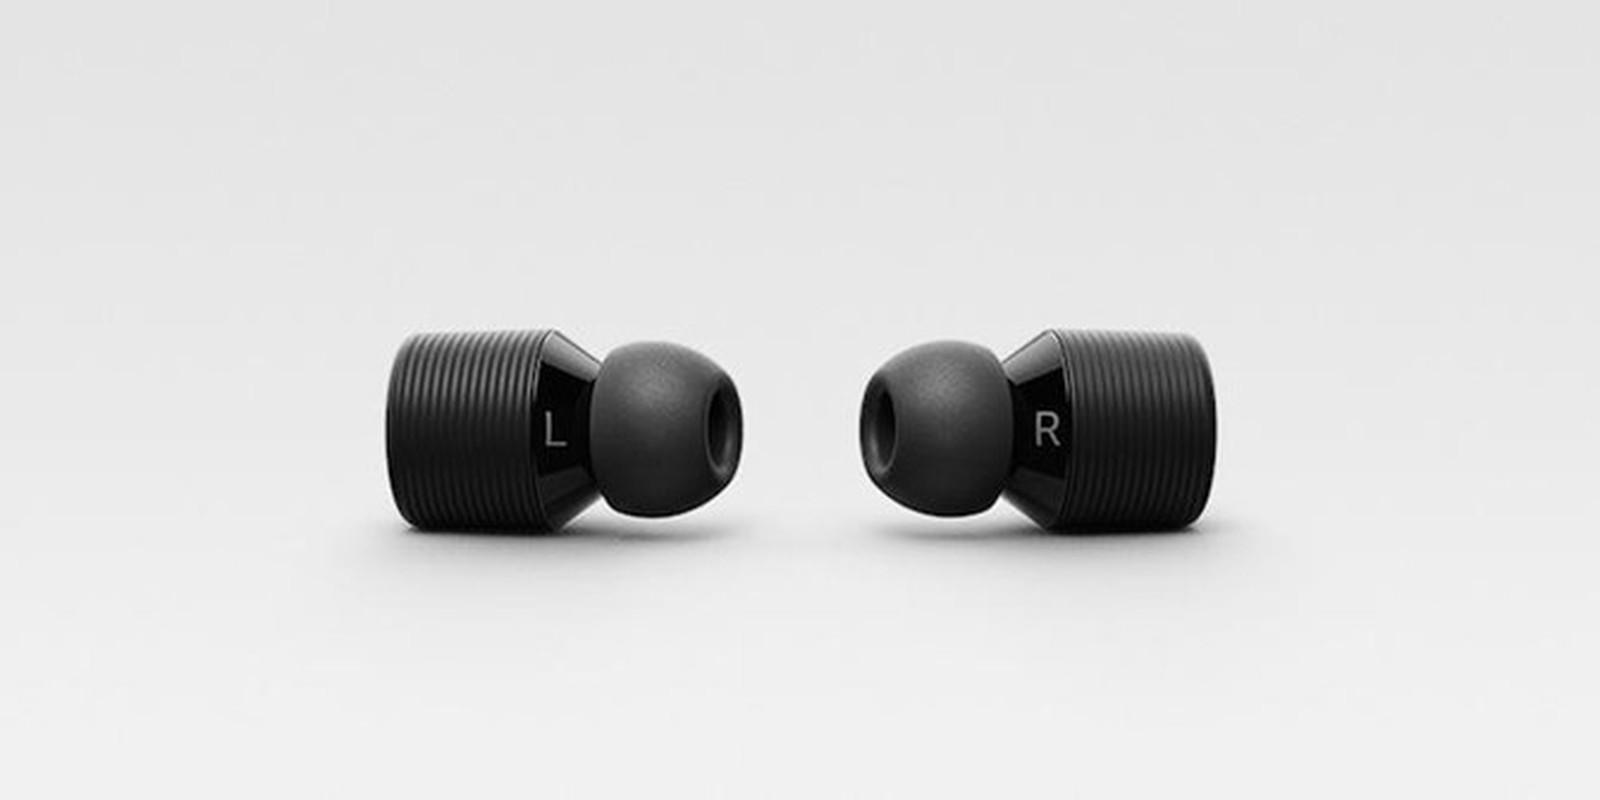 Nhung cap tai nghe Bluetooth hay khong kem Apple AirPods-Hinh-5